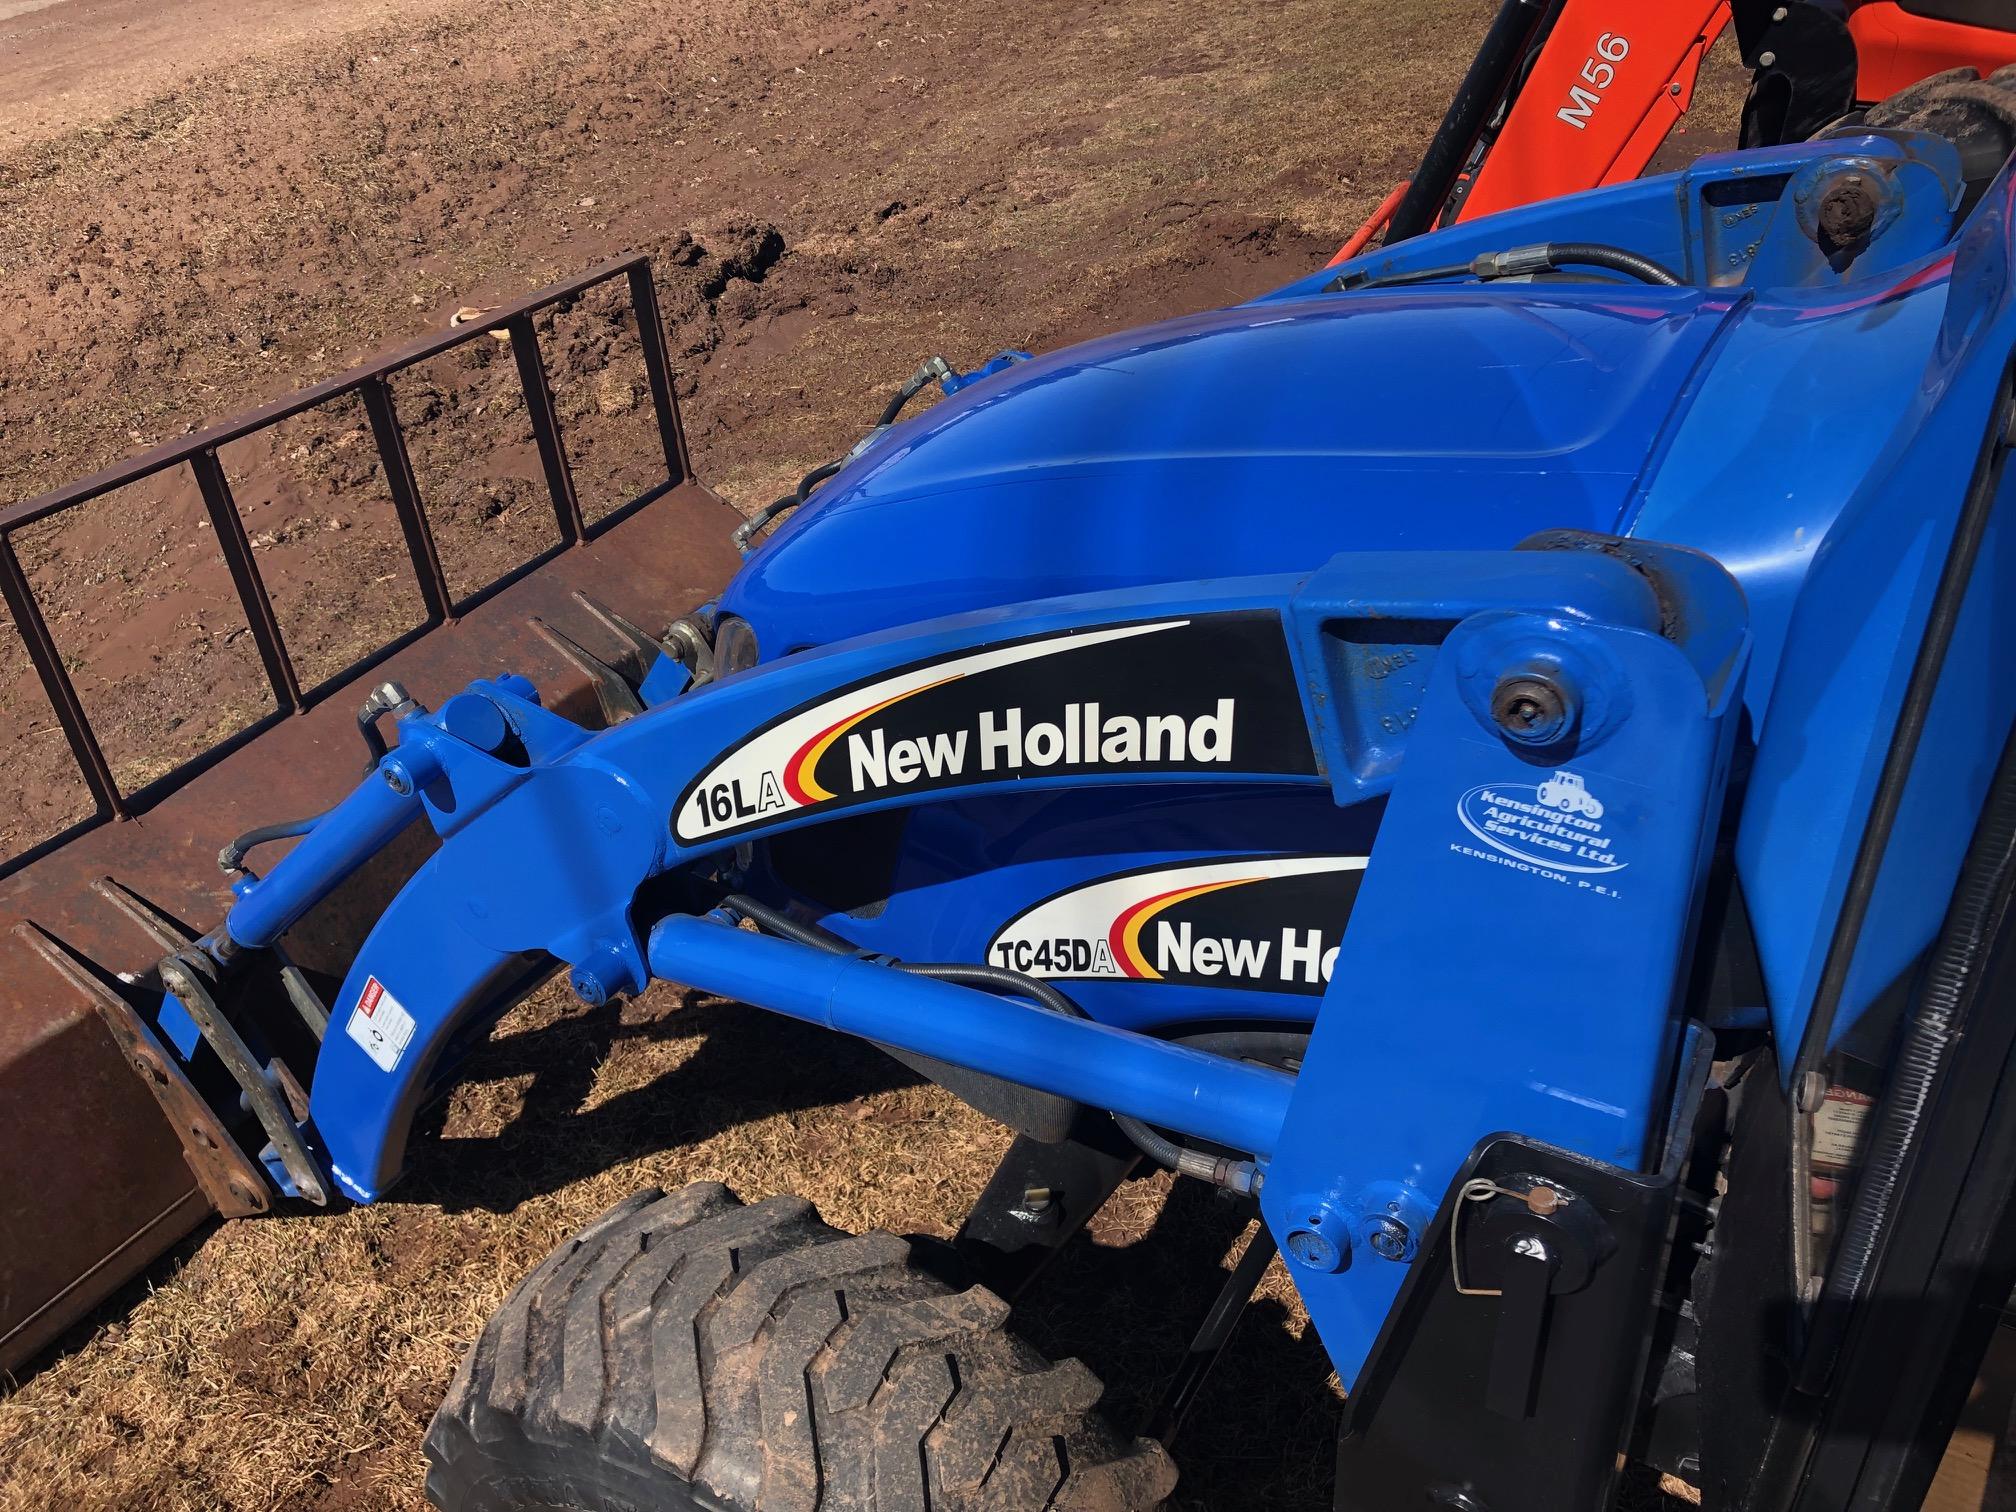 2005 New Holland TC45DA Tractor for sale in Kensington, PE